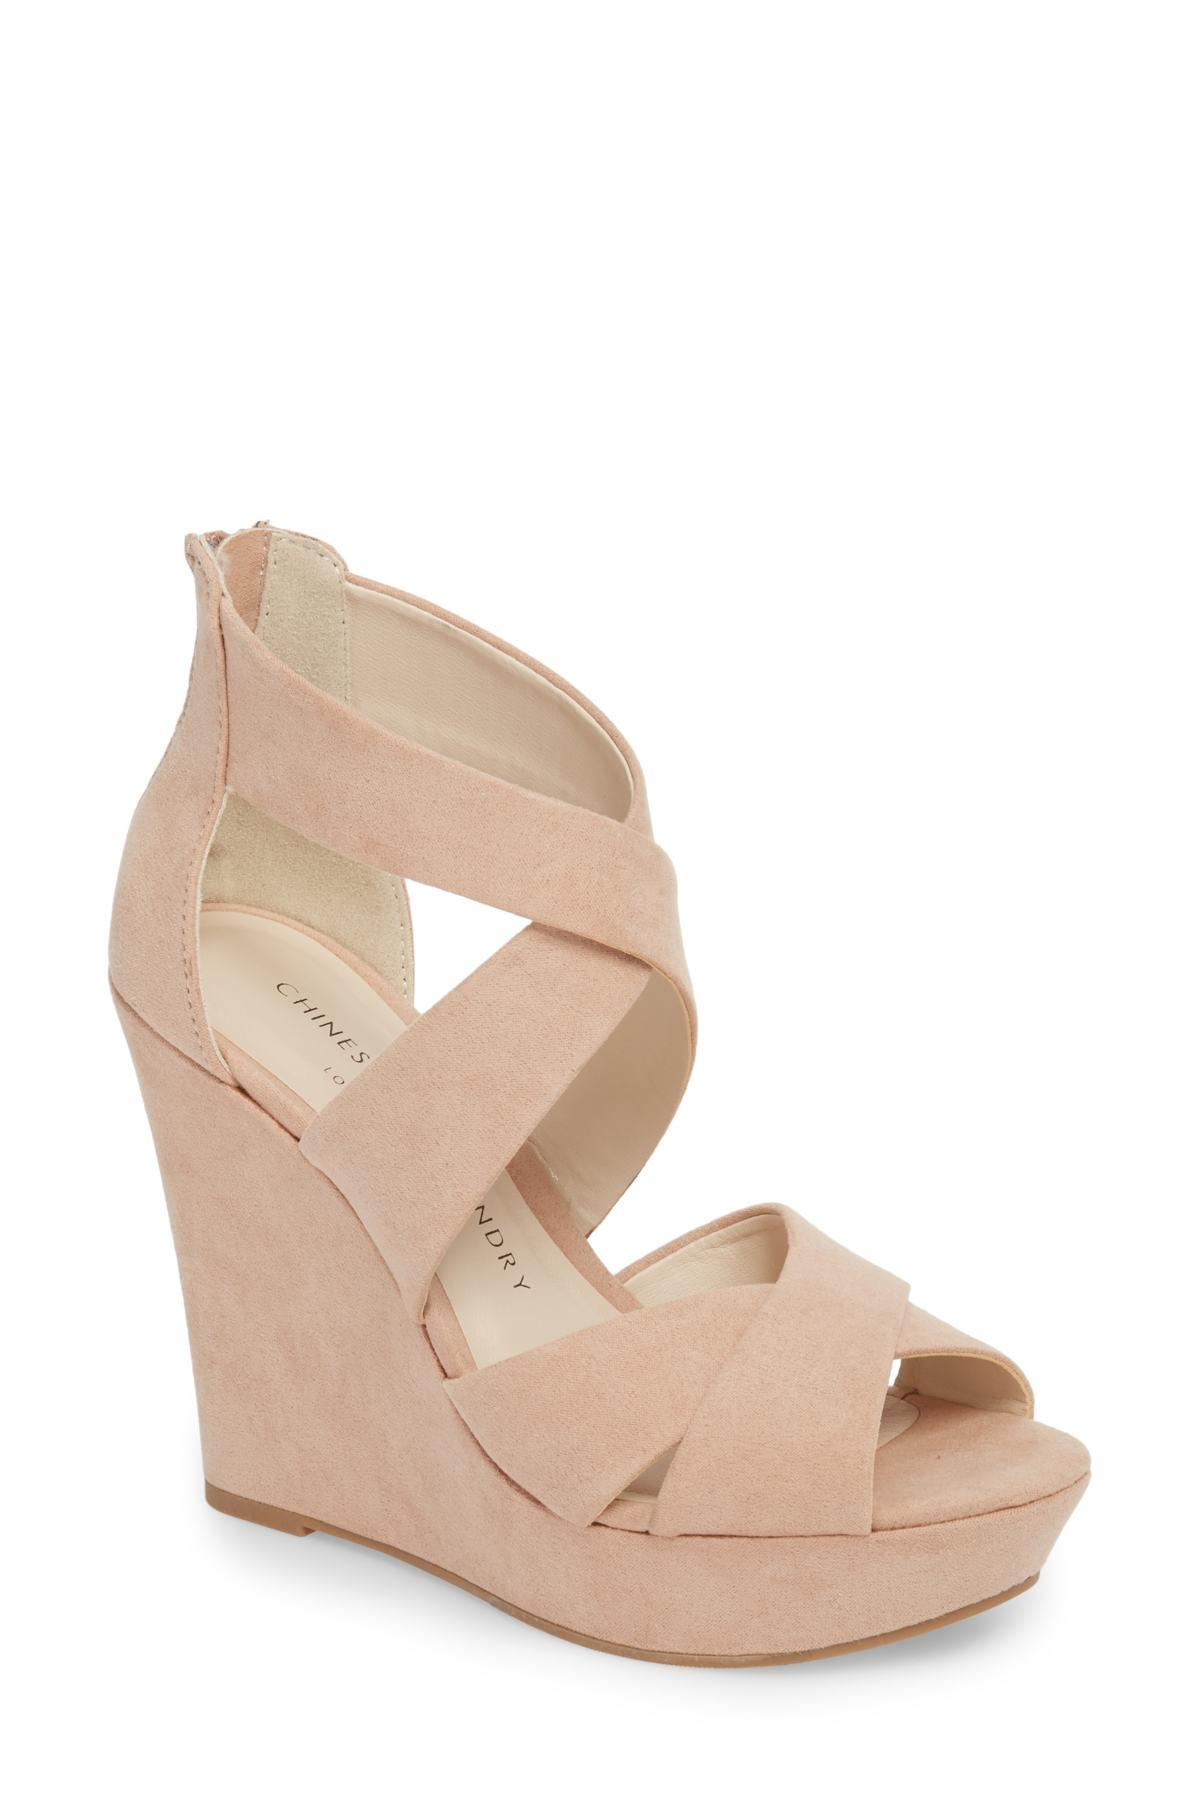 df96d8ec5f5bd8 Lyst - Chinese Laundry Milani Platform Wedge Sandal (women) in ...